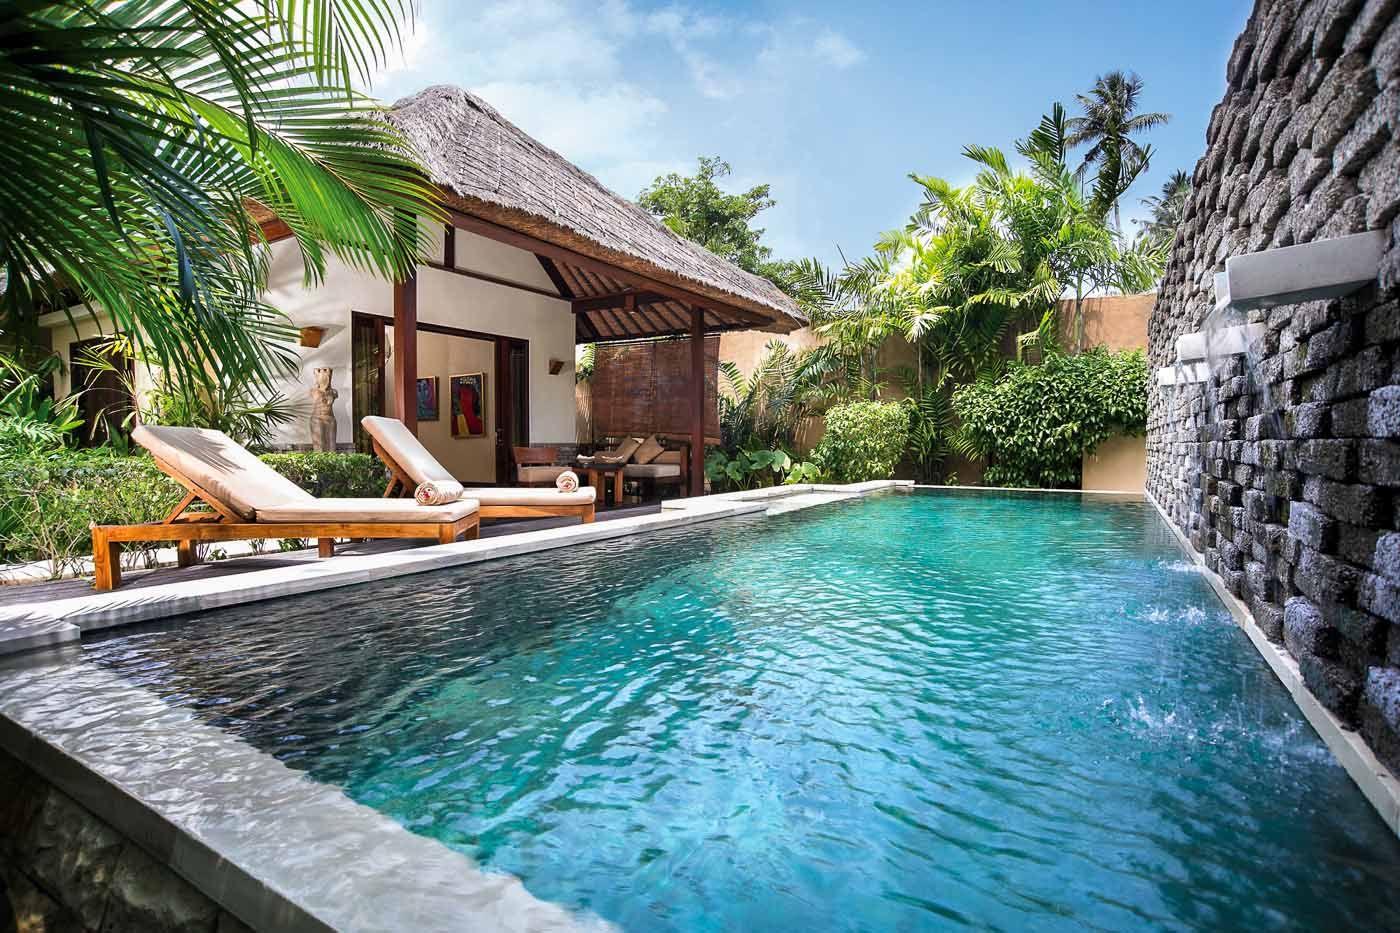 Qunci Villas One Bedroom Pool Villa in Senggigi Lombok